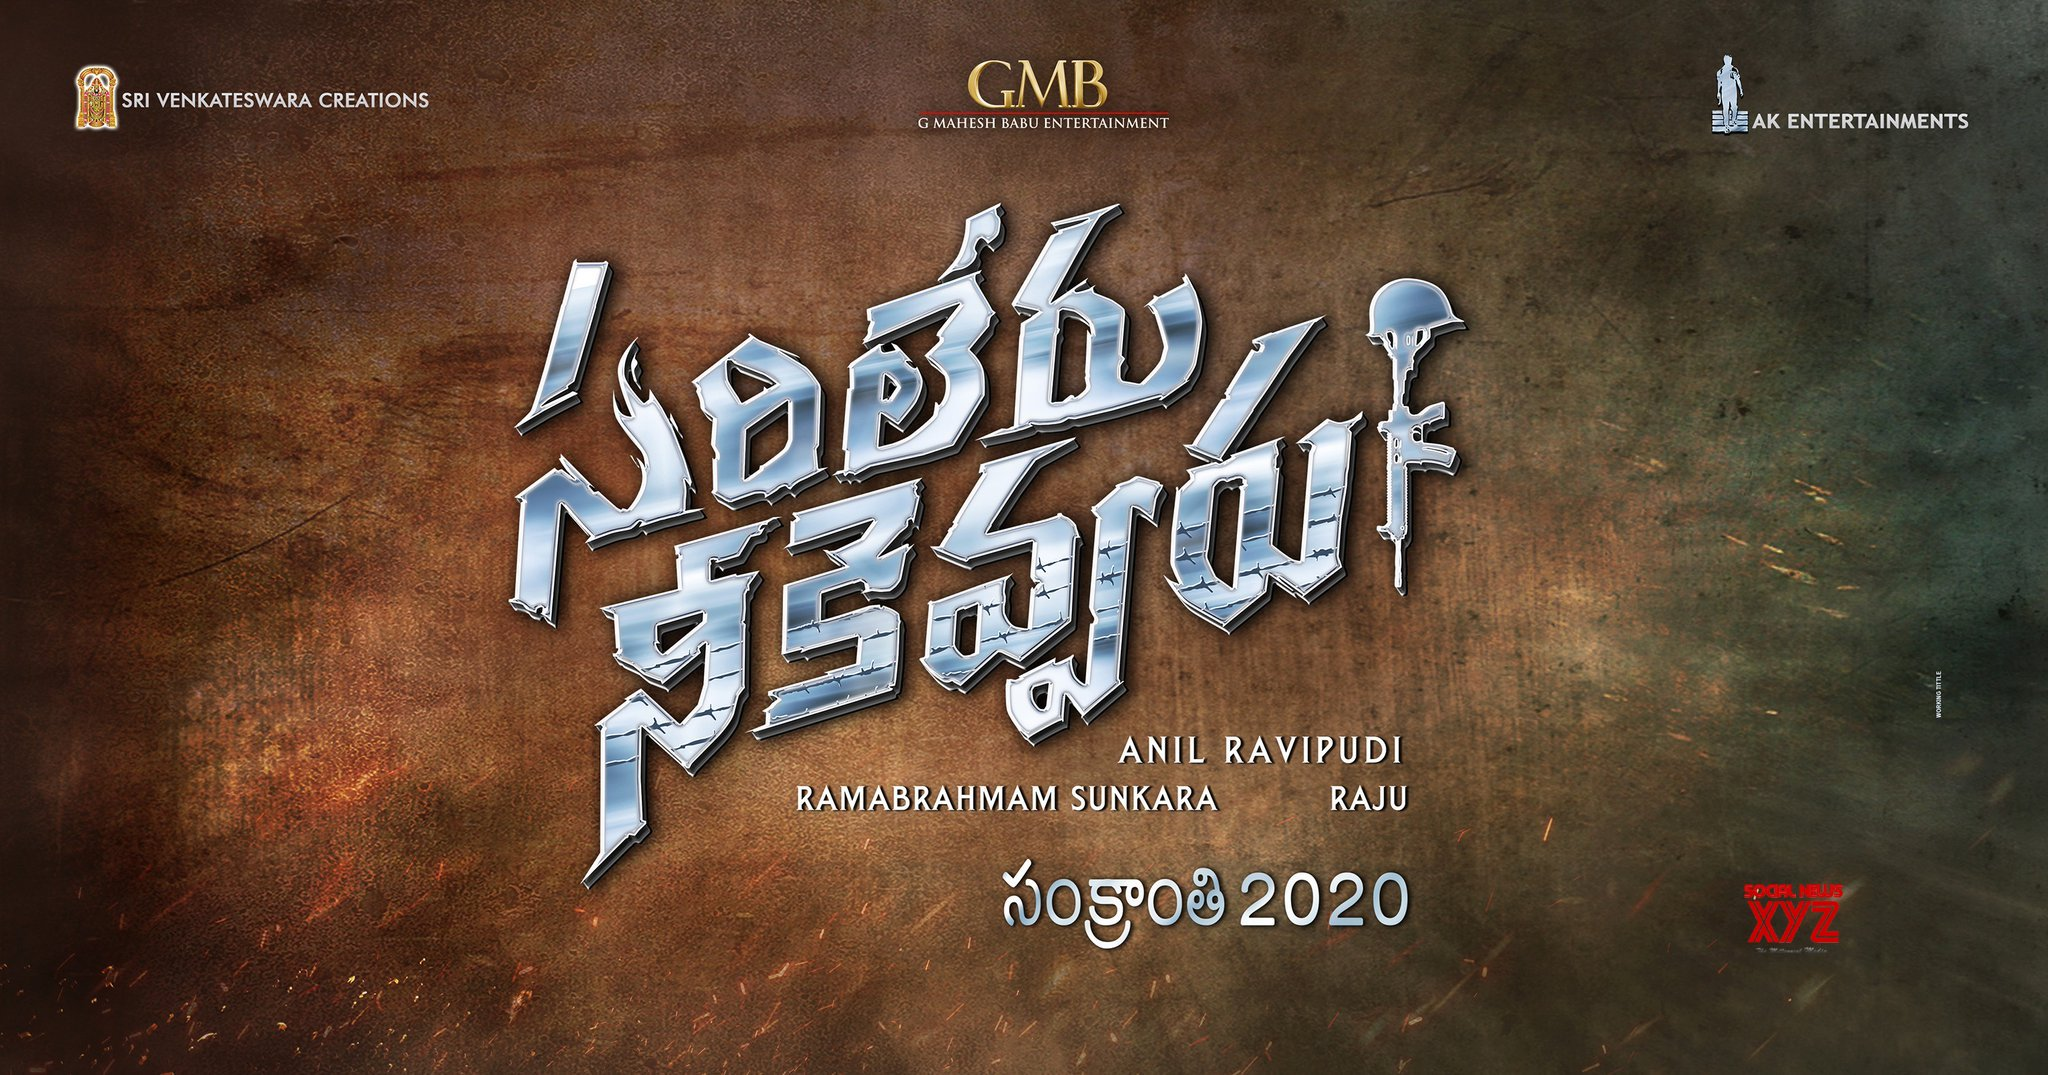 Mahesh Babu's next #SSMB26 Movie Titled Sarileru Neekevvaru